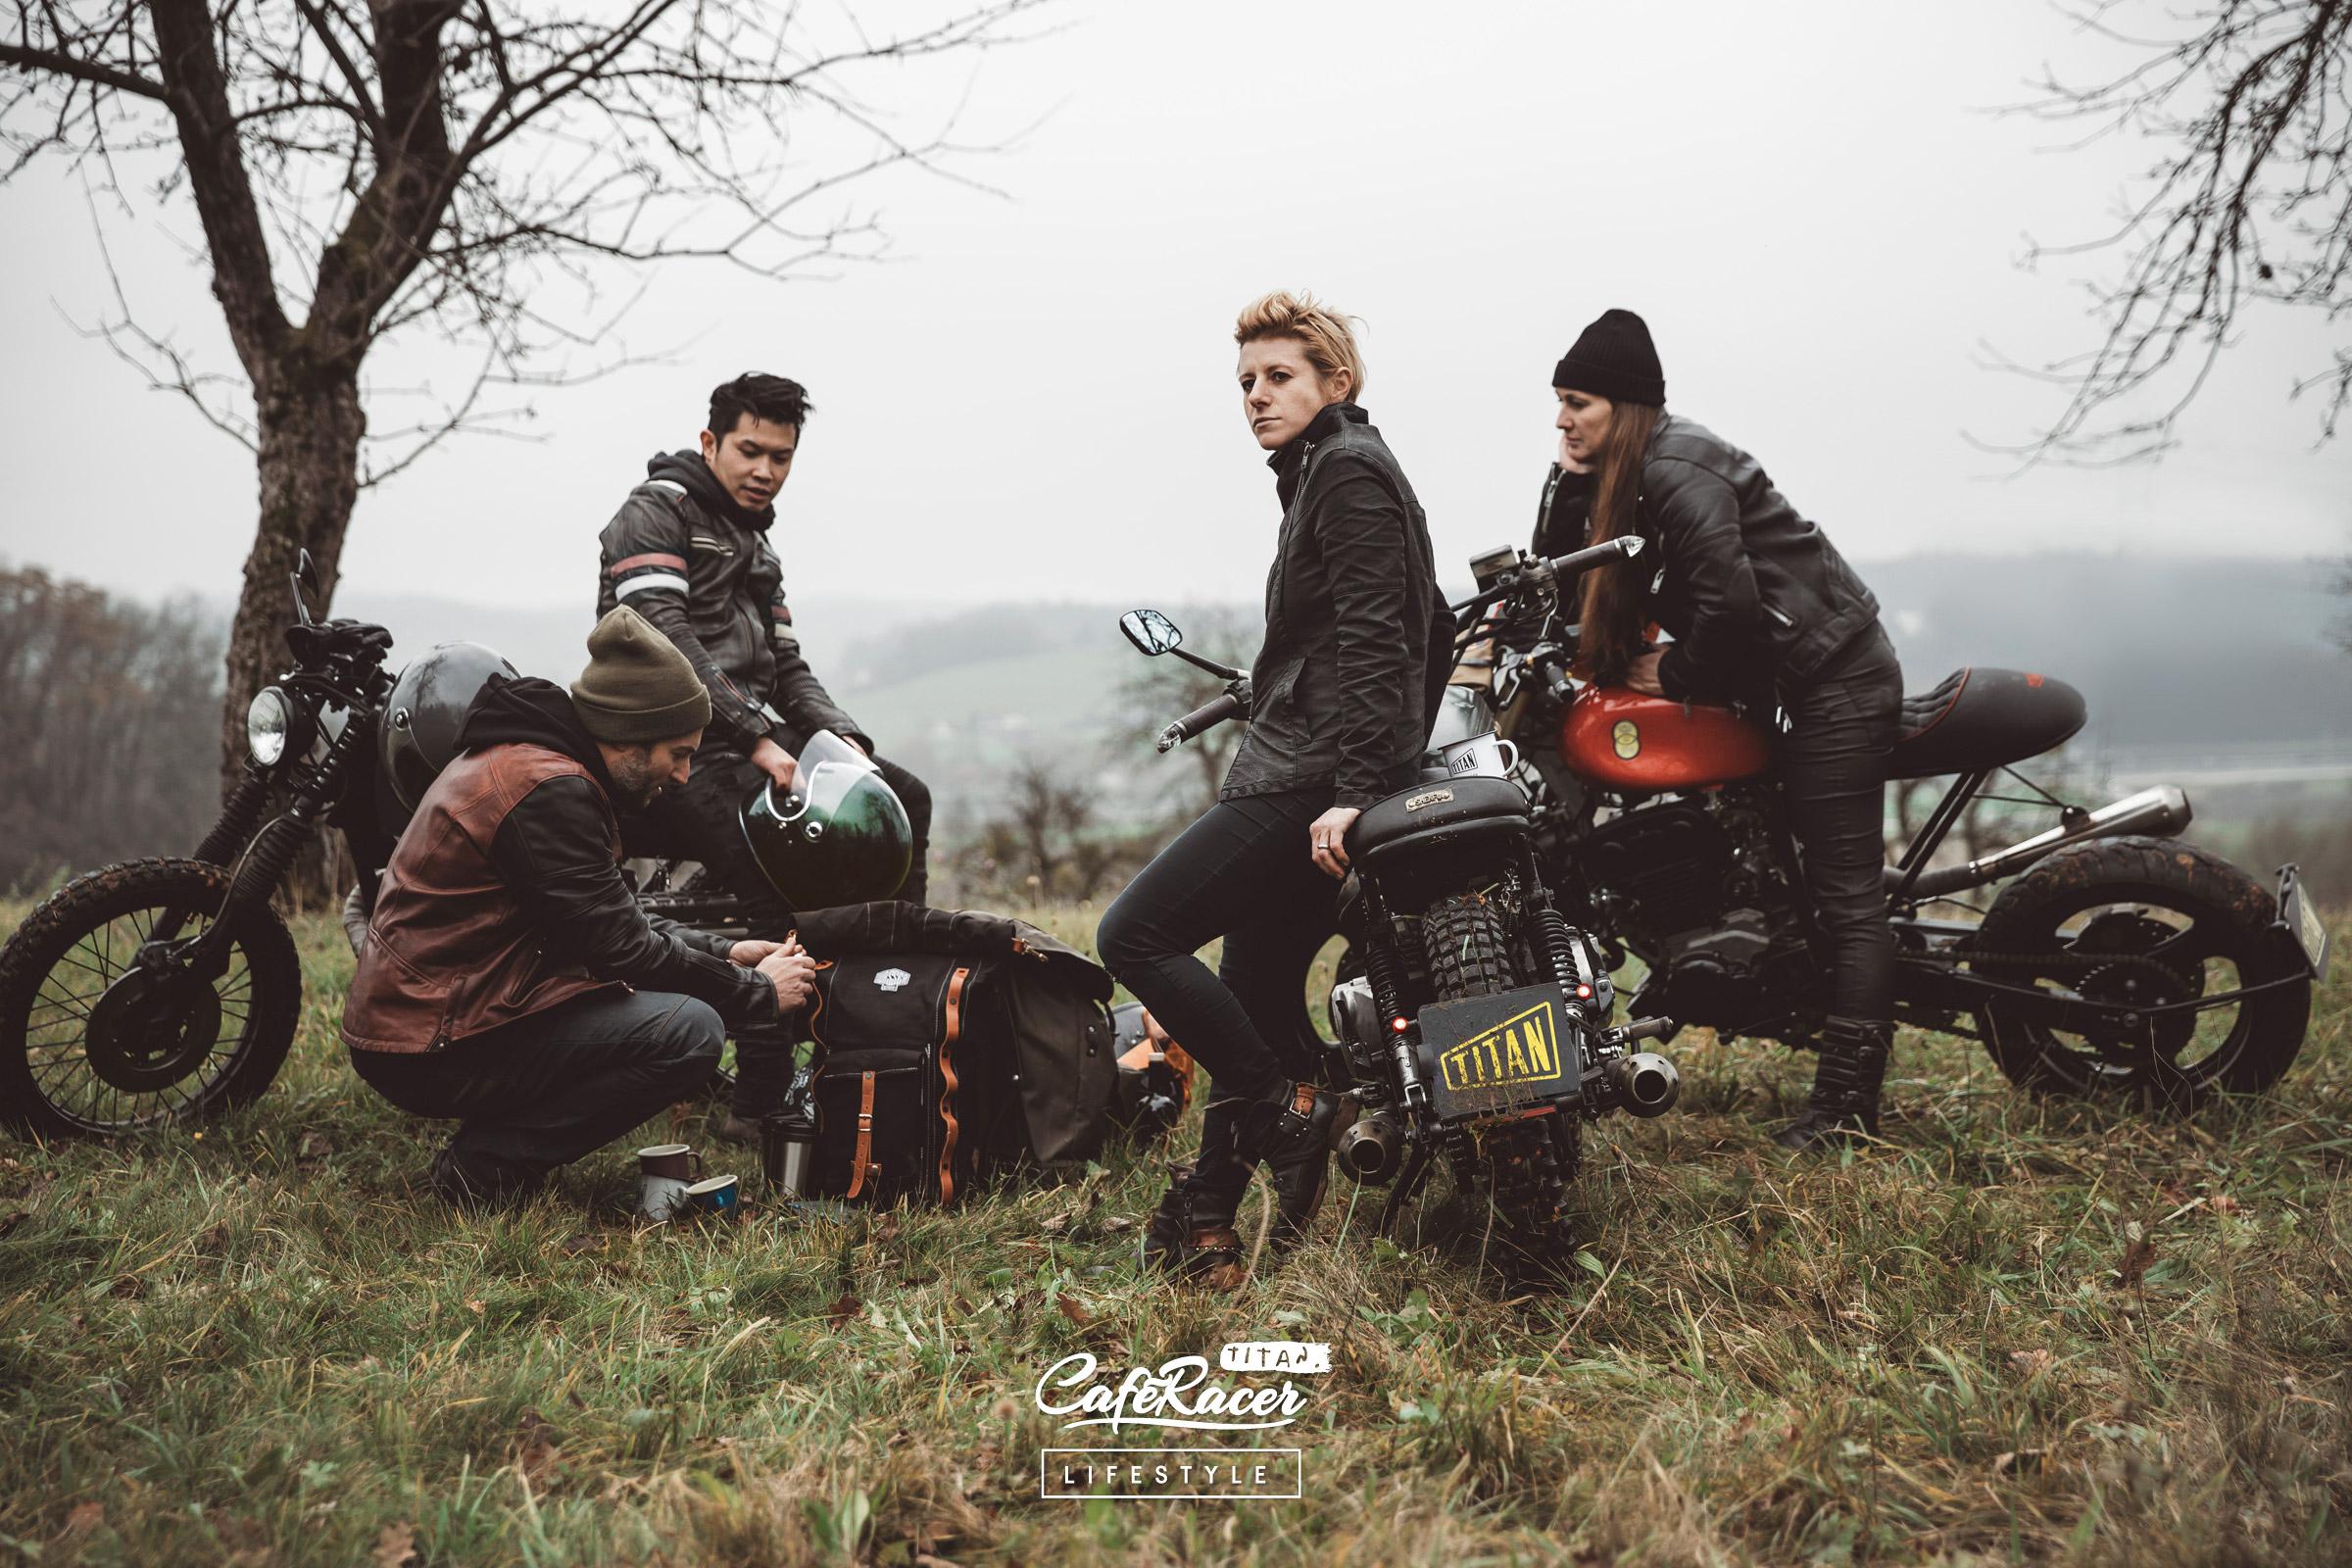 TITAN-Motorcycles-Company-Team-CafeRacer-Lifestyle-Graz-Styria-Austria-MotorradUmbau-MotorradBekleidung-Biltwell-Bores-Ladies-Frauen-Mode Alternative Louis Damenmode Bikergirl Ladies Gear